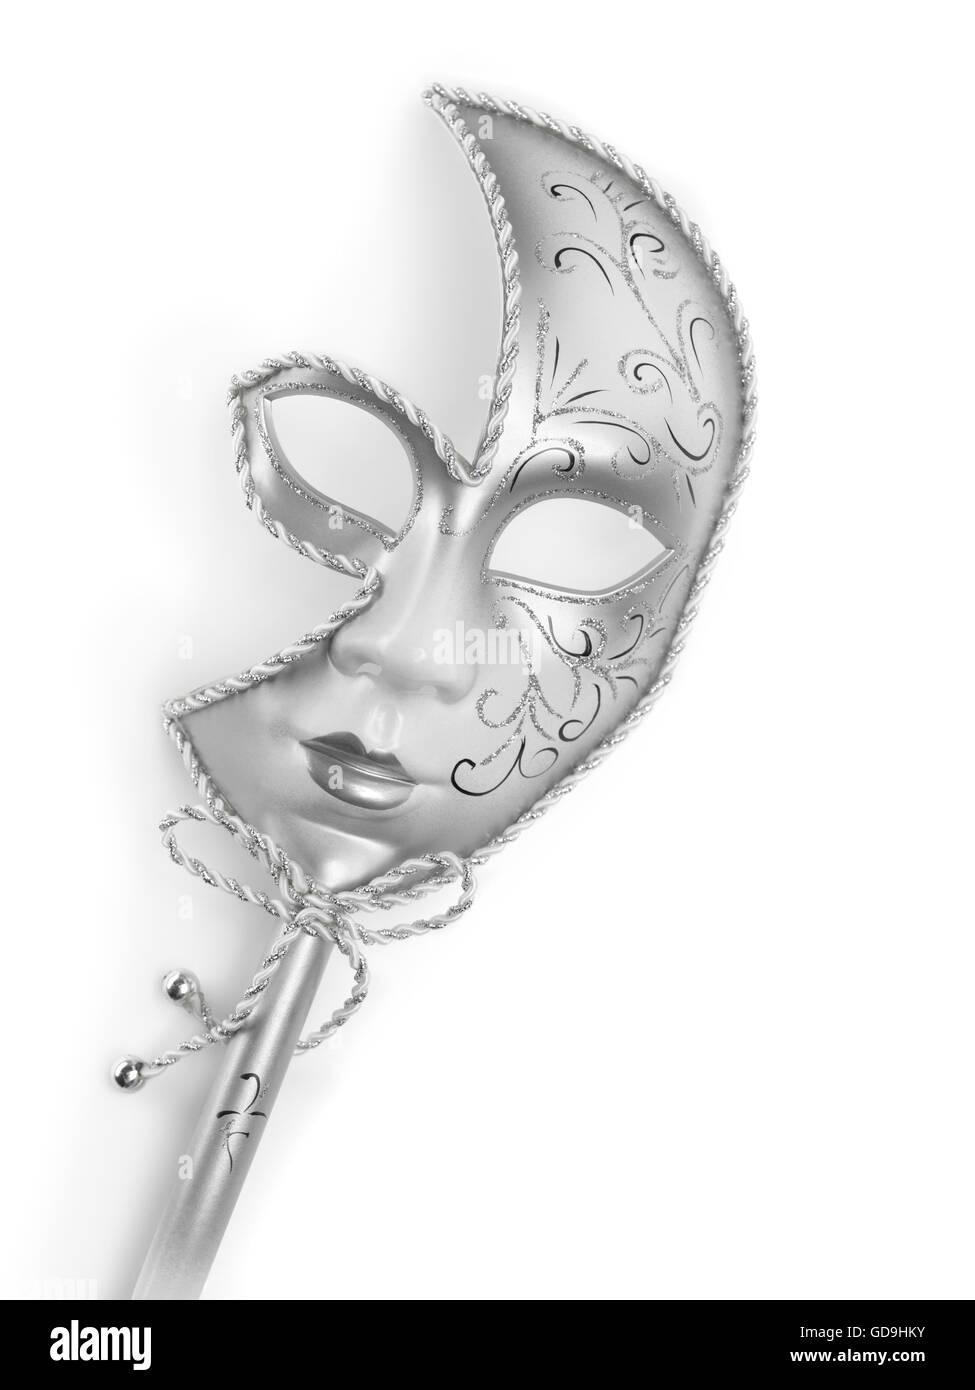 Silver Venetian mask - Stock Image